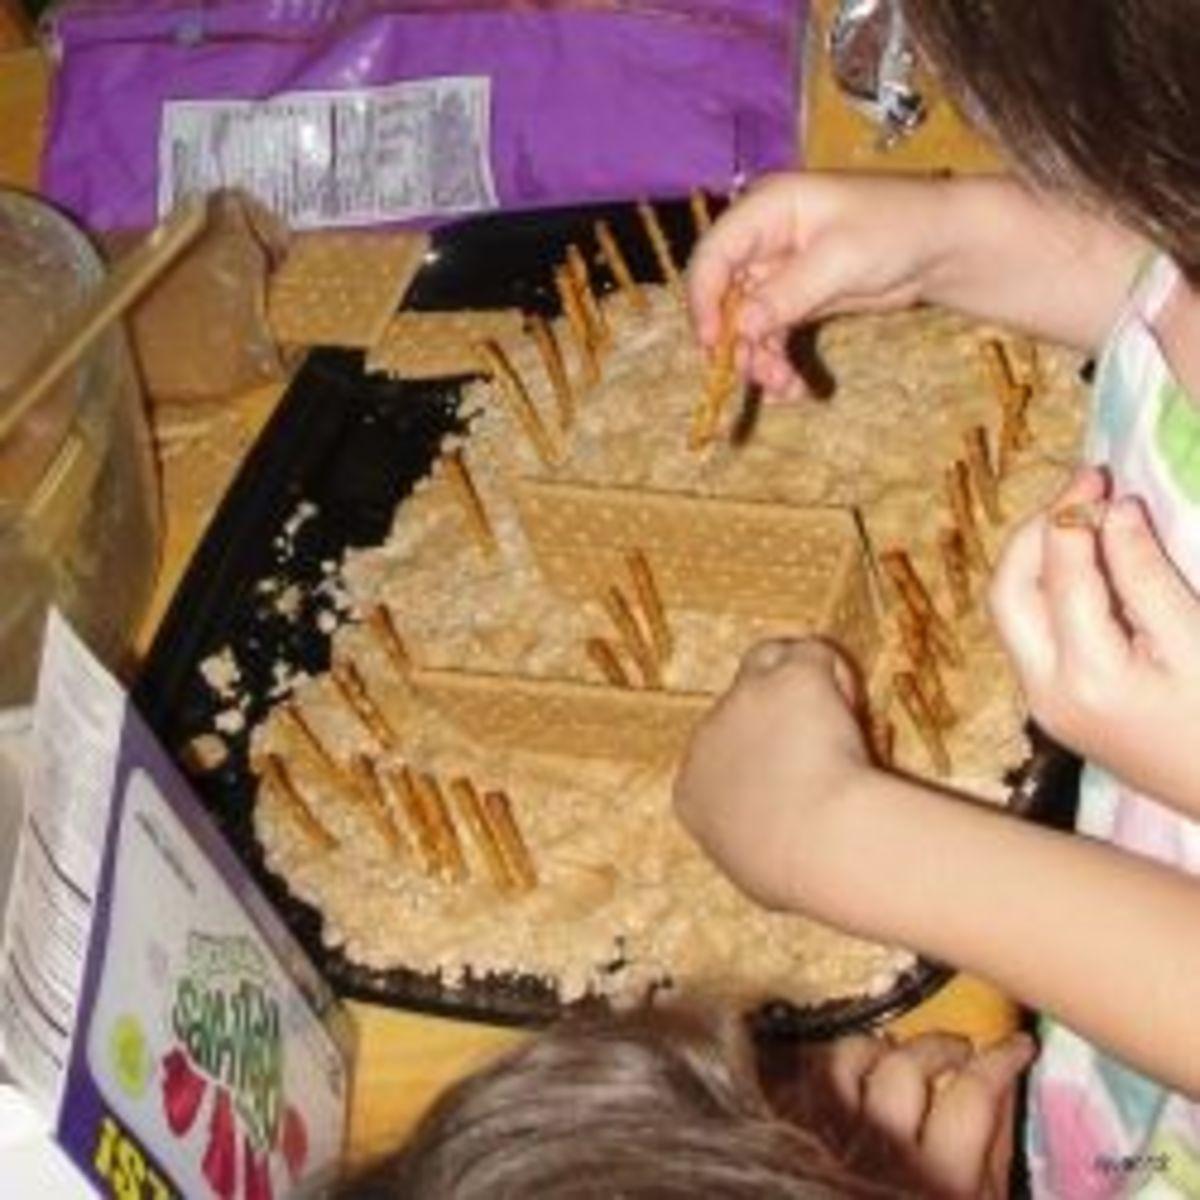 Edible model of the tabernacle